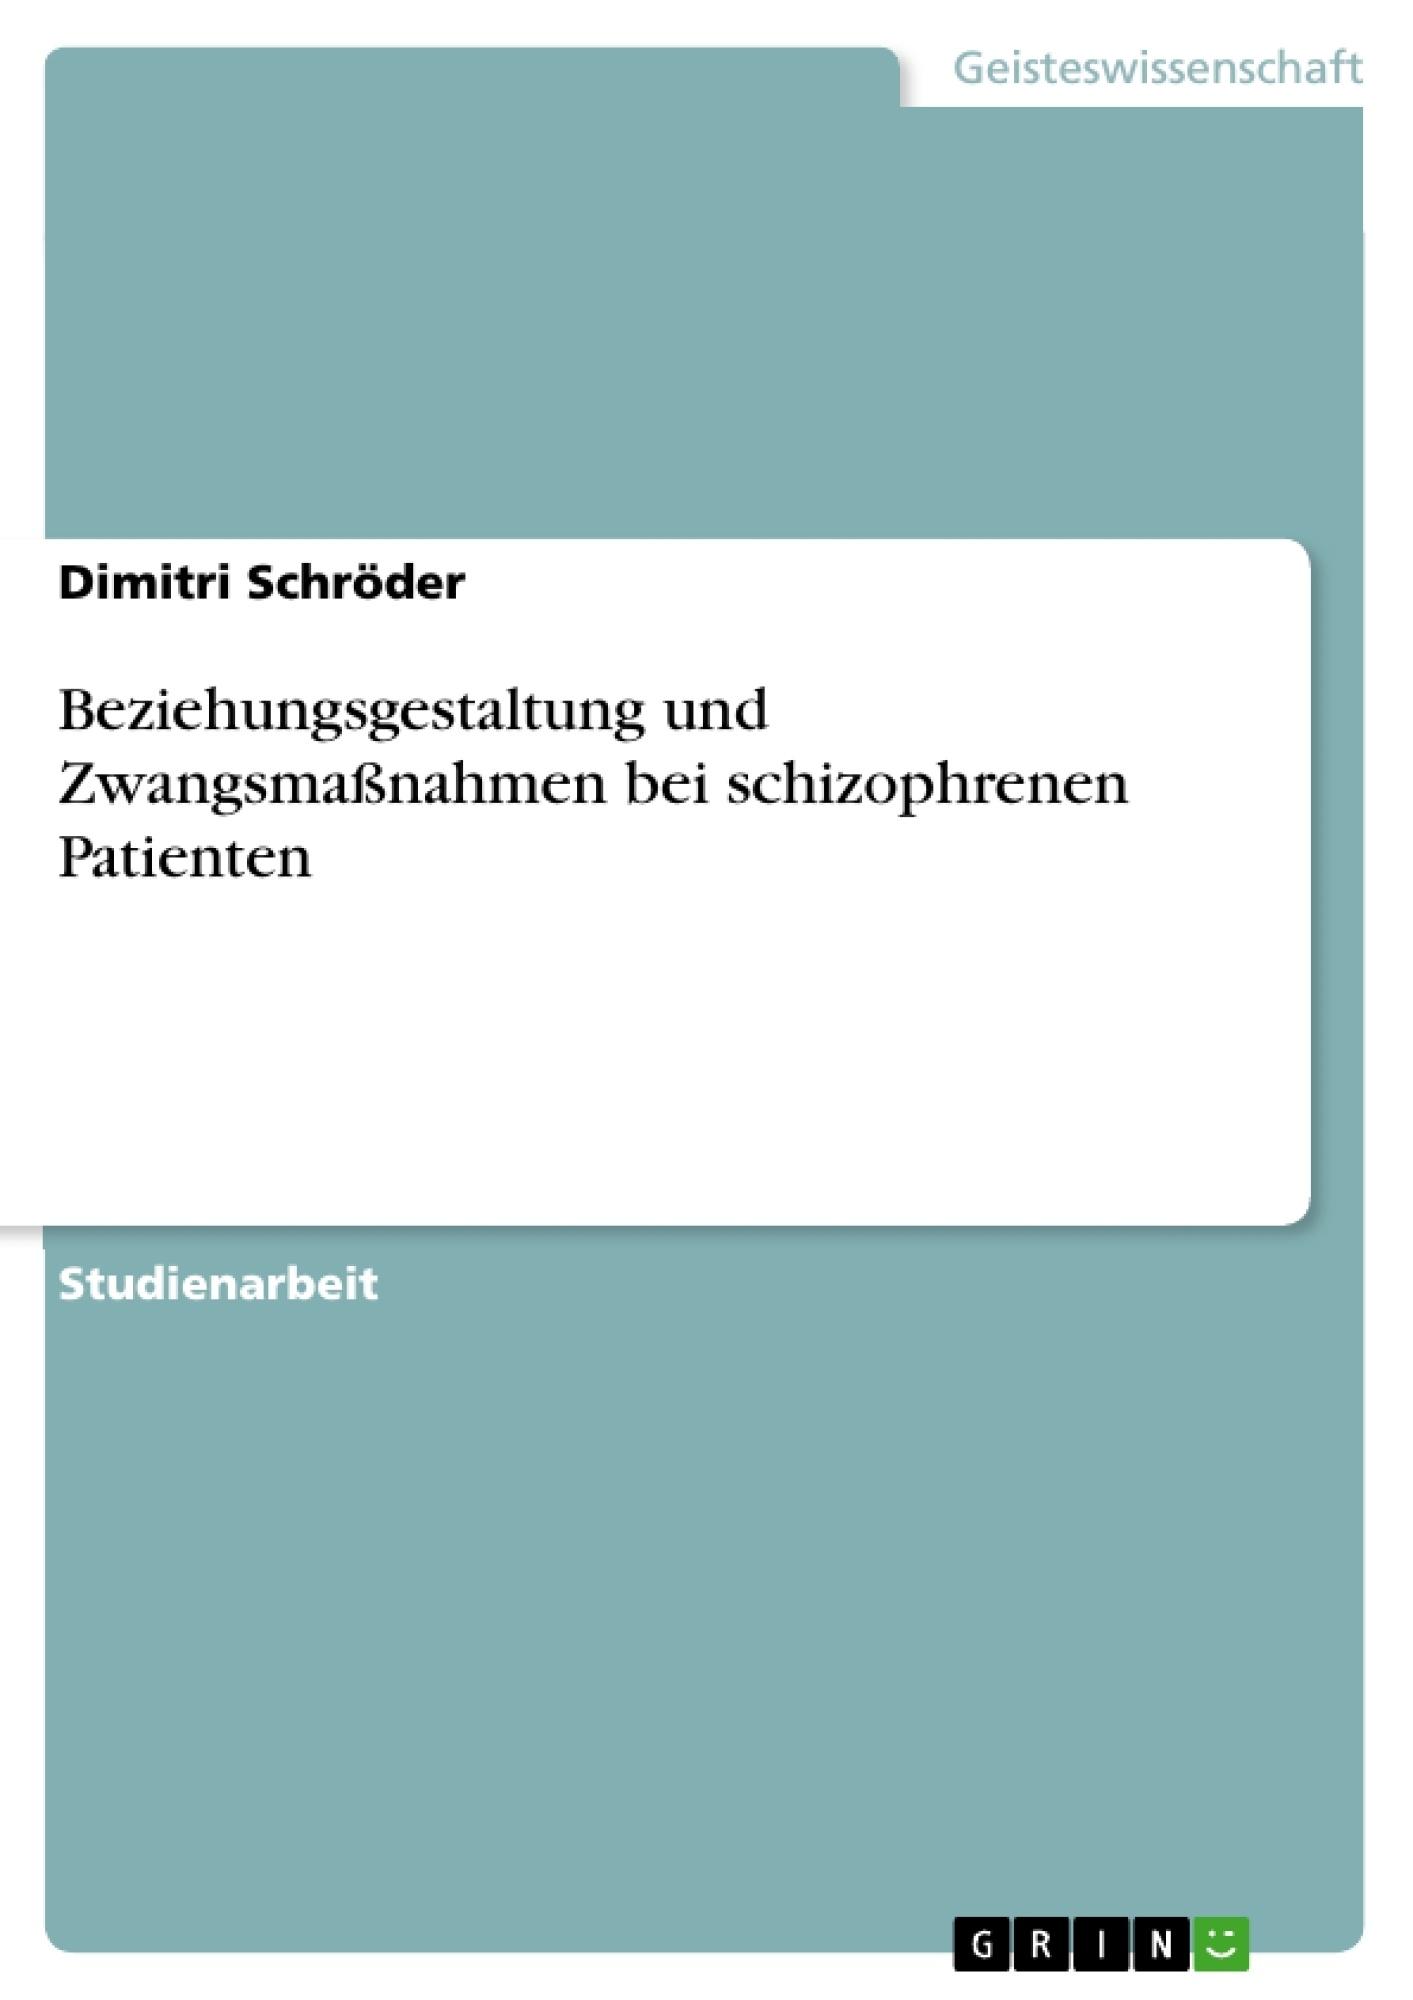 Titel: Beziehungsgestaltung und Zwangsmaßnahmen bei schizophrenen Patienten